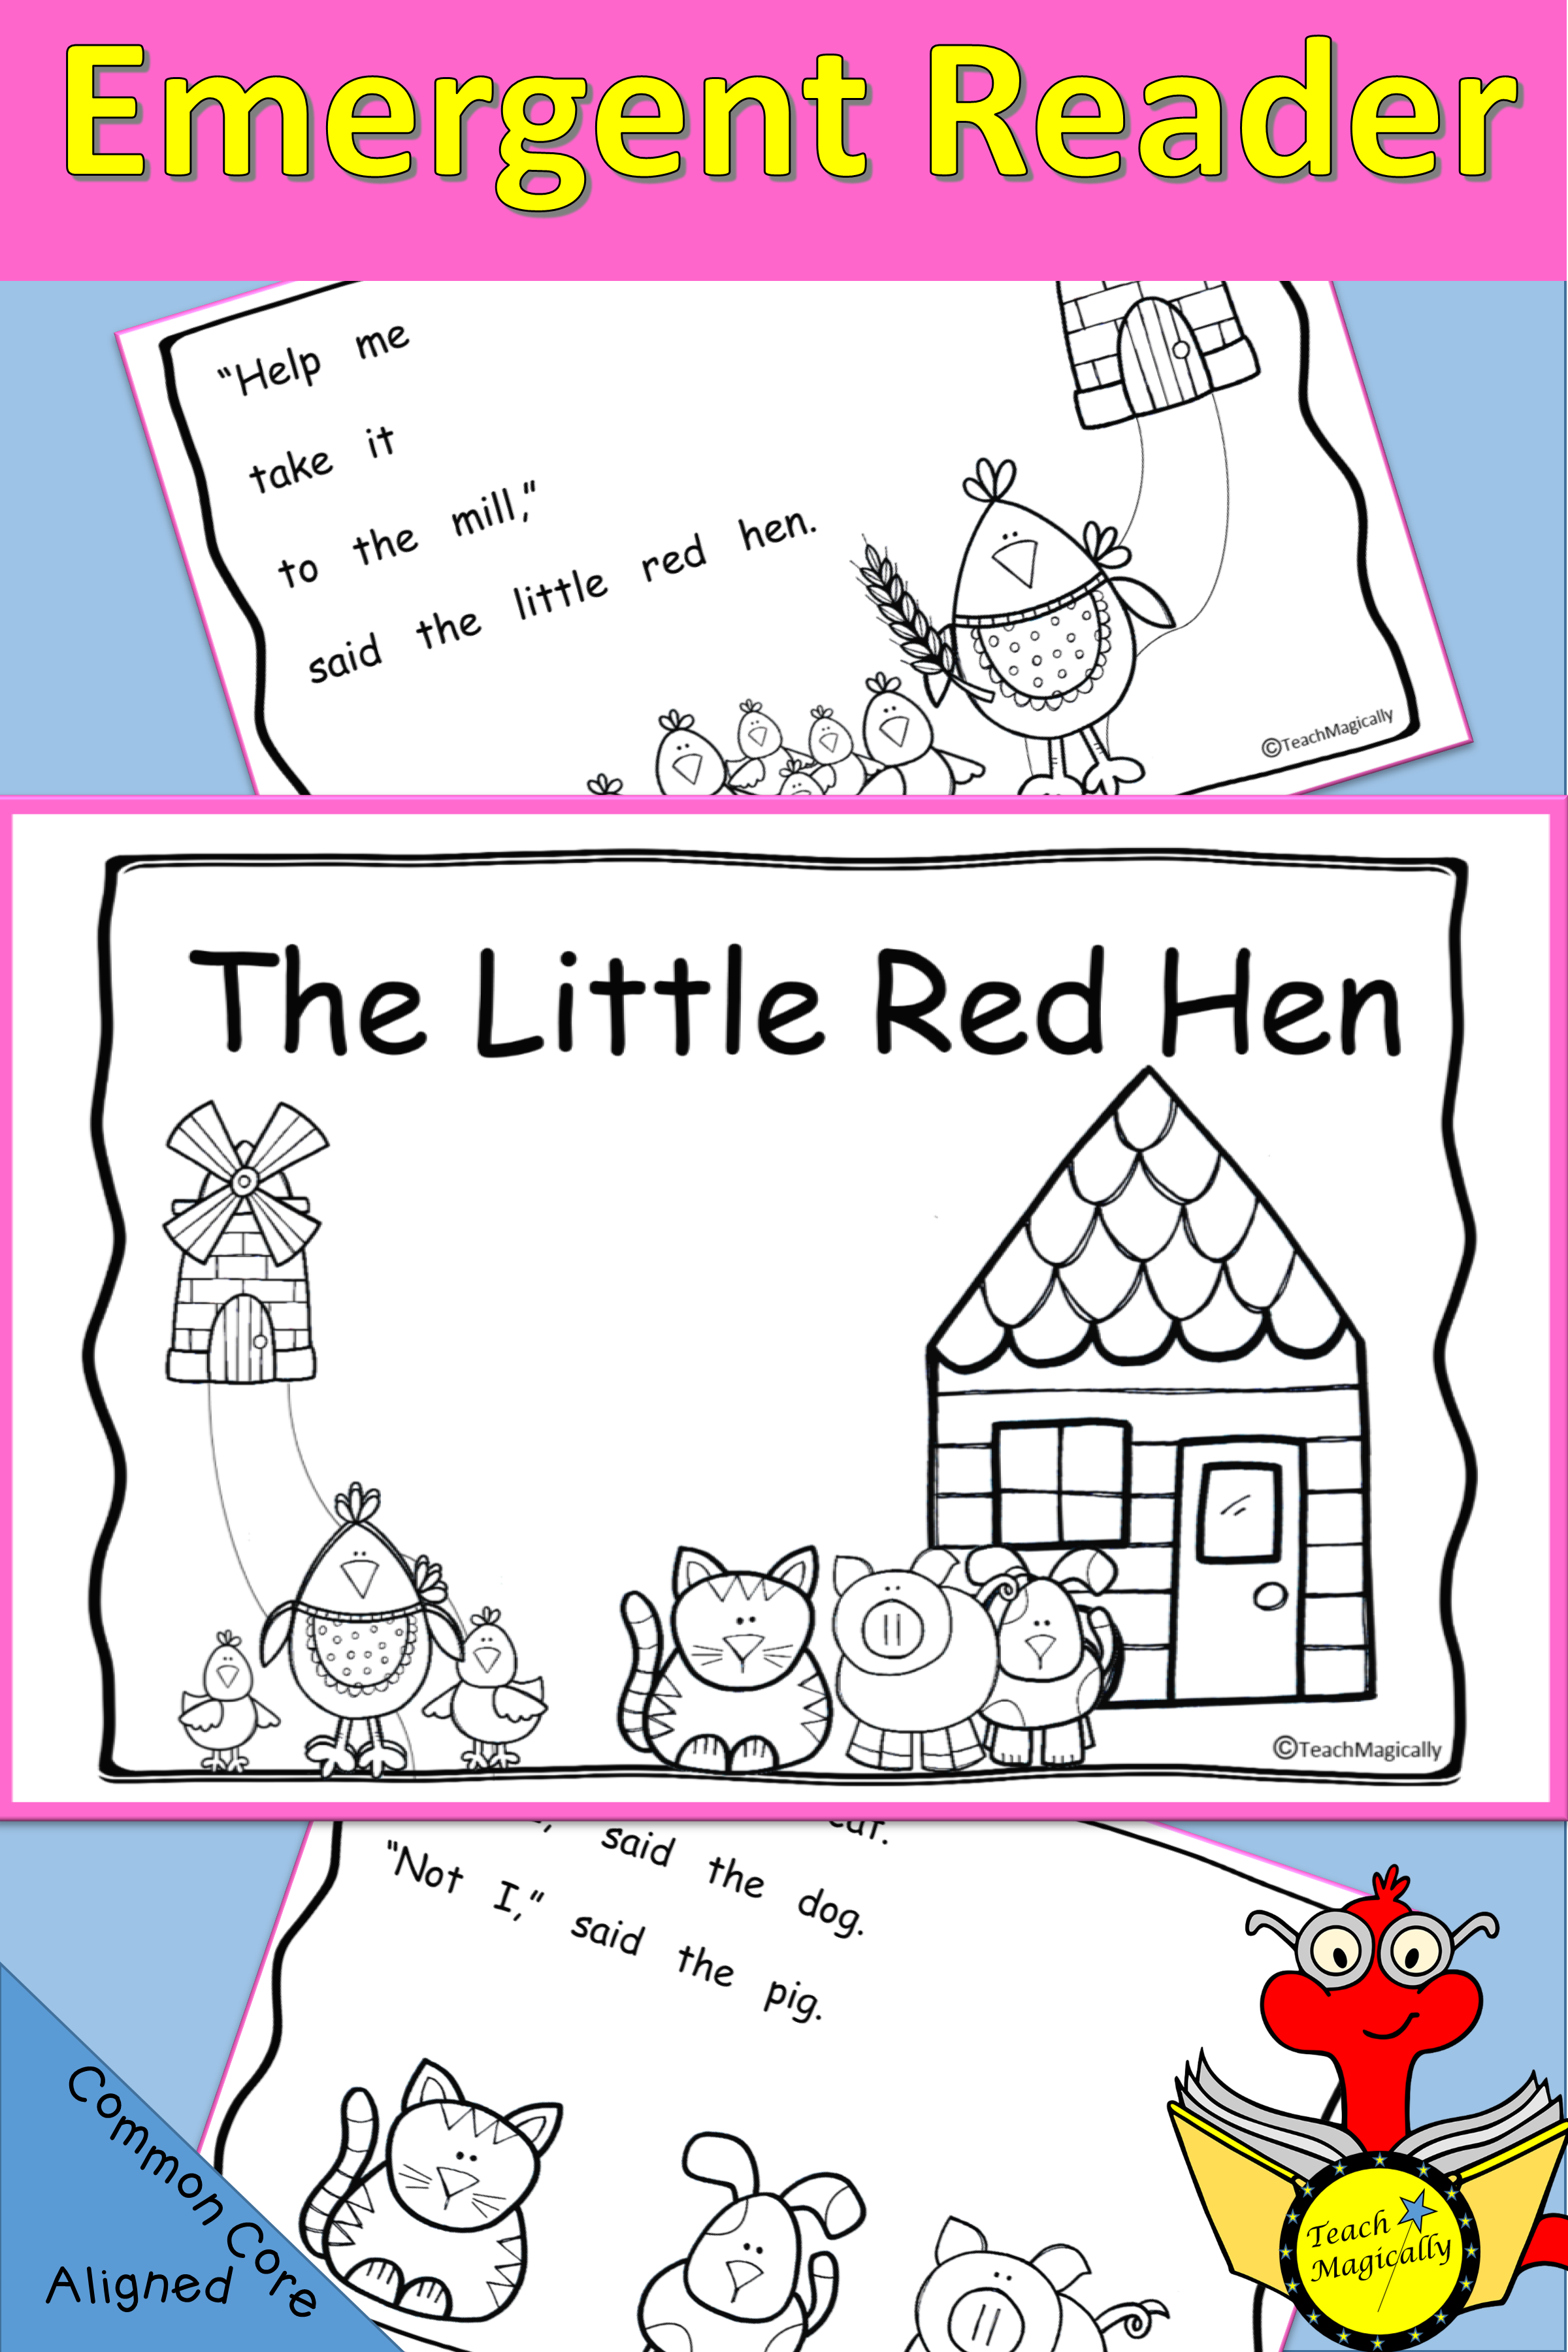 - Emergent Reader Book The Little Red Hen Folktale Kindergarten